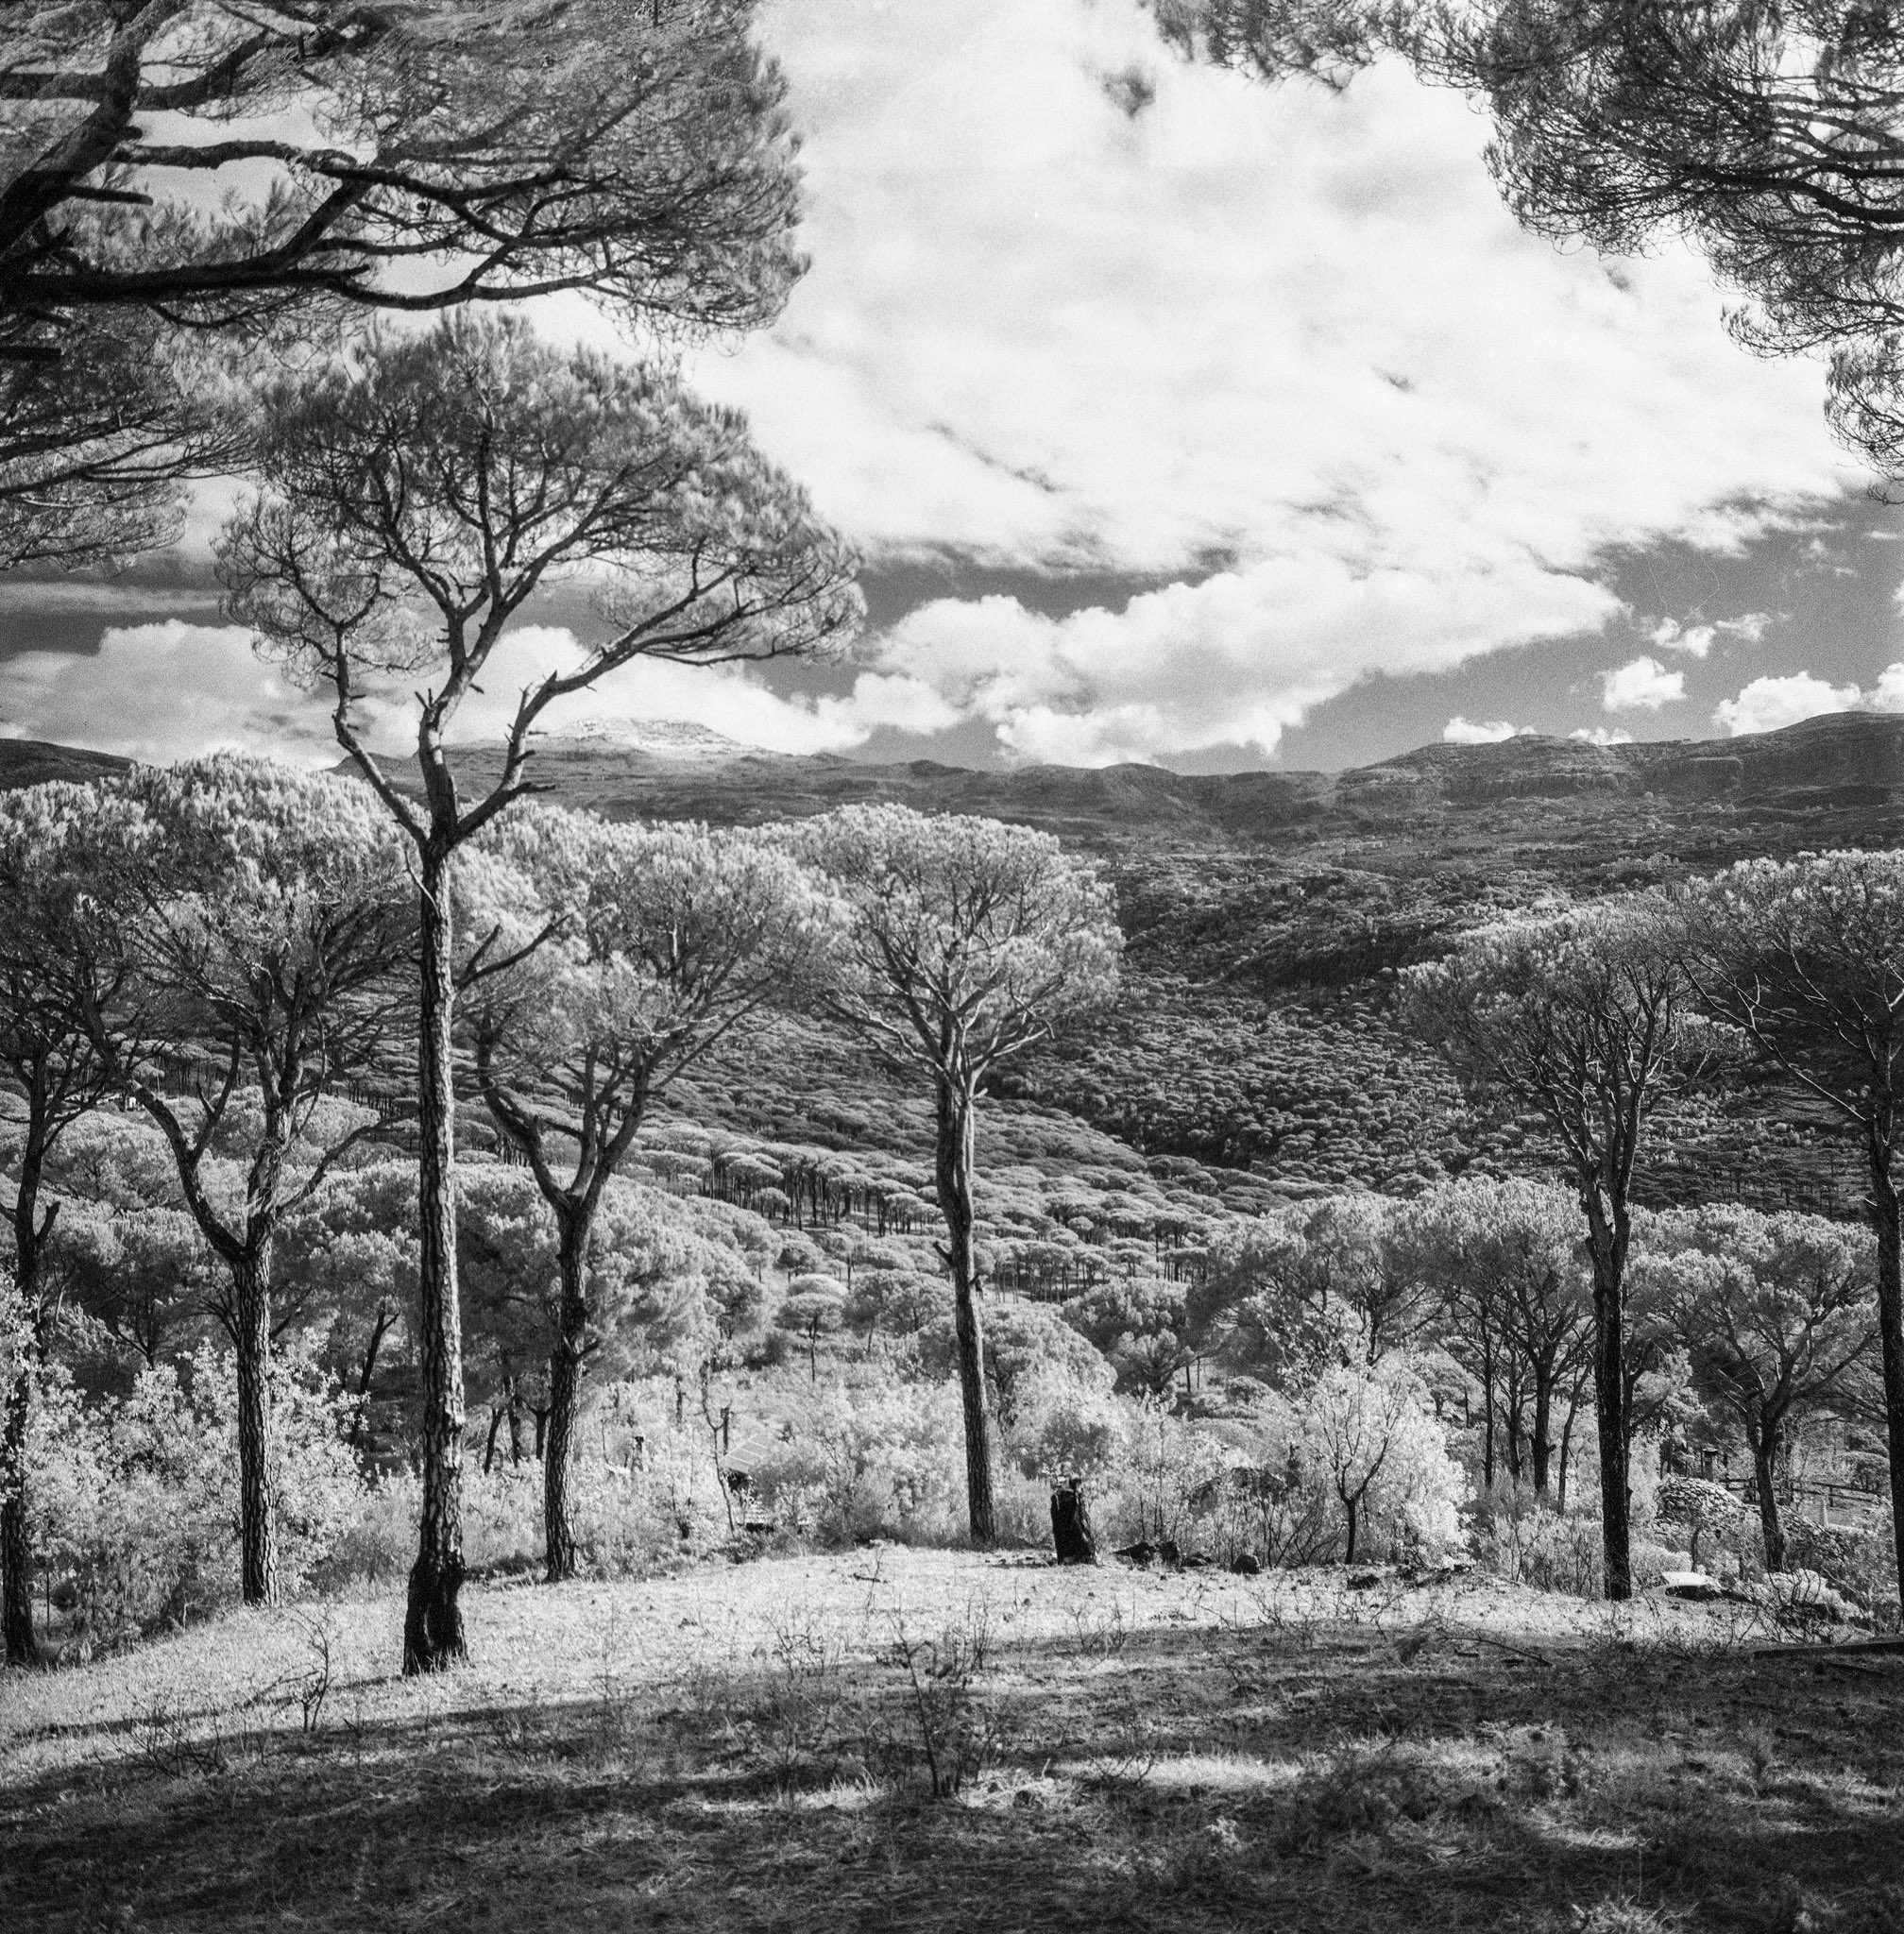 @AdibMufty Nature in a dreamy world! Camera: Hasselblad 500cm ?: Ilford SFX200 #filmphotography #believeinfilm #ilfordphoto #fridayfavourites #shotonsfx